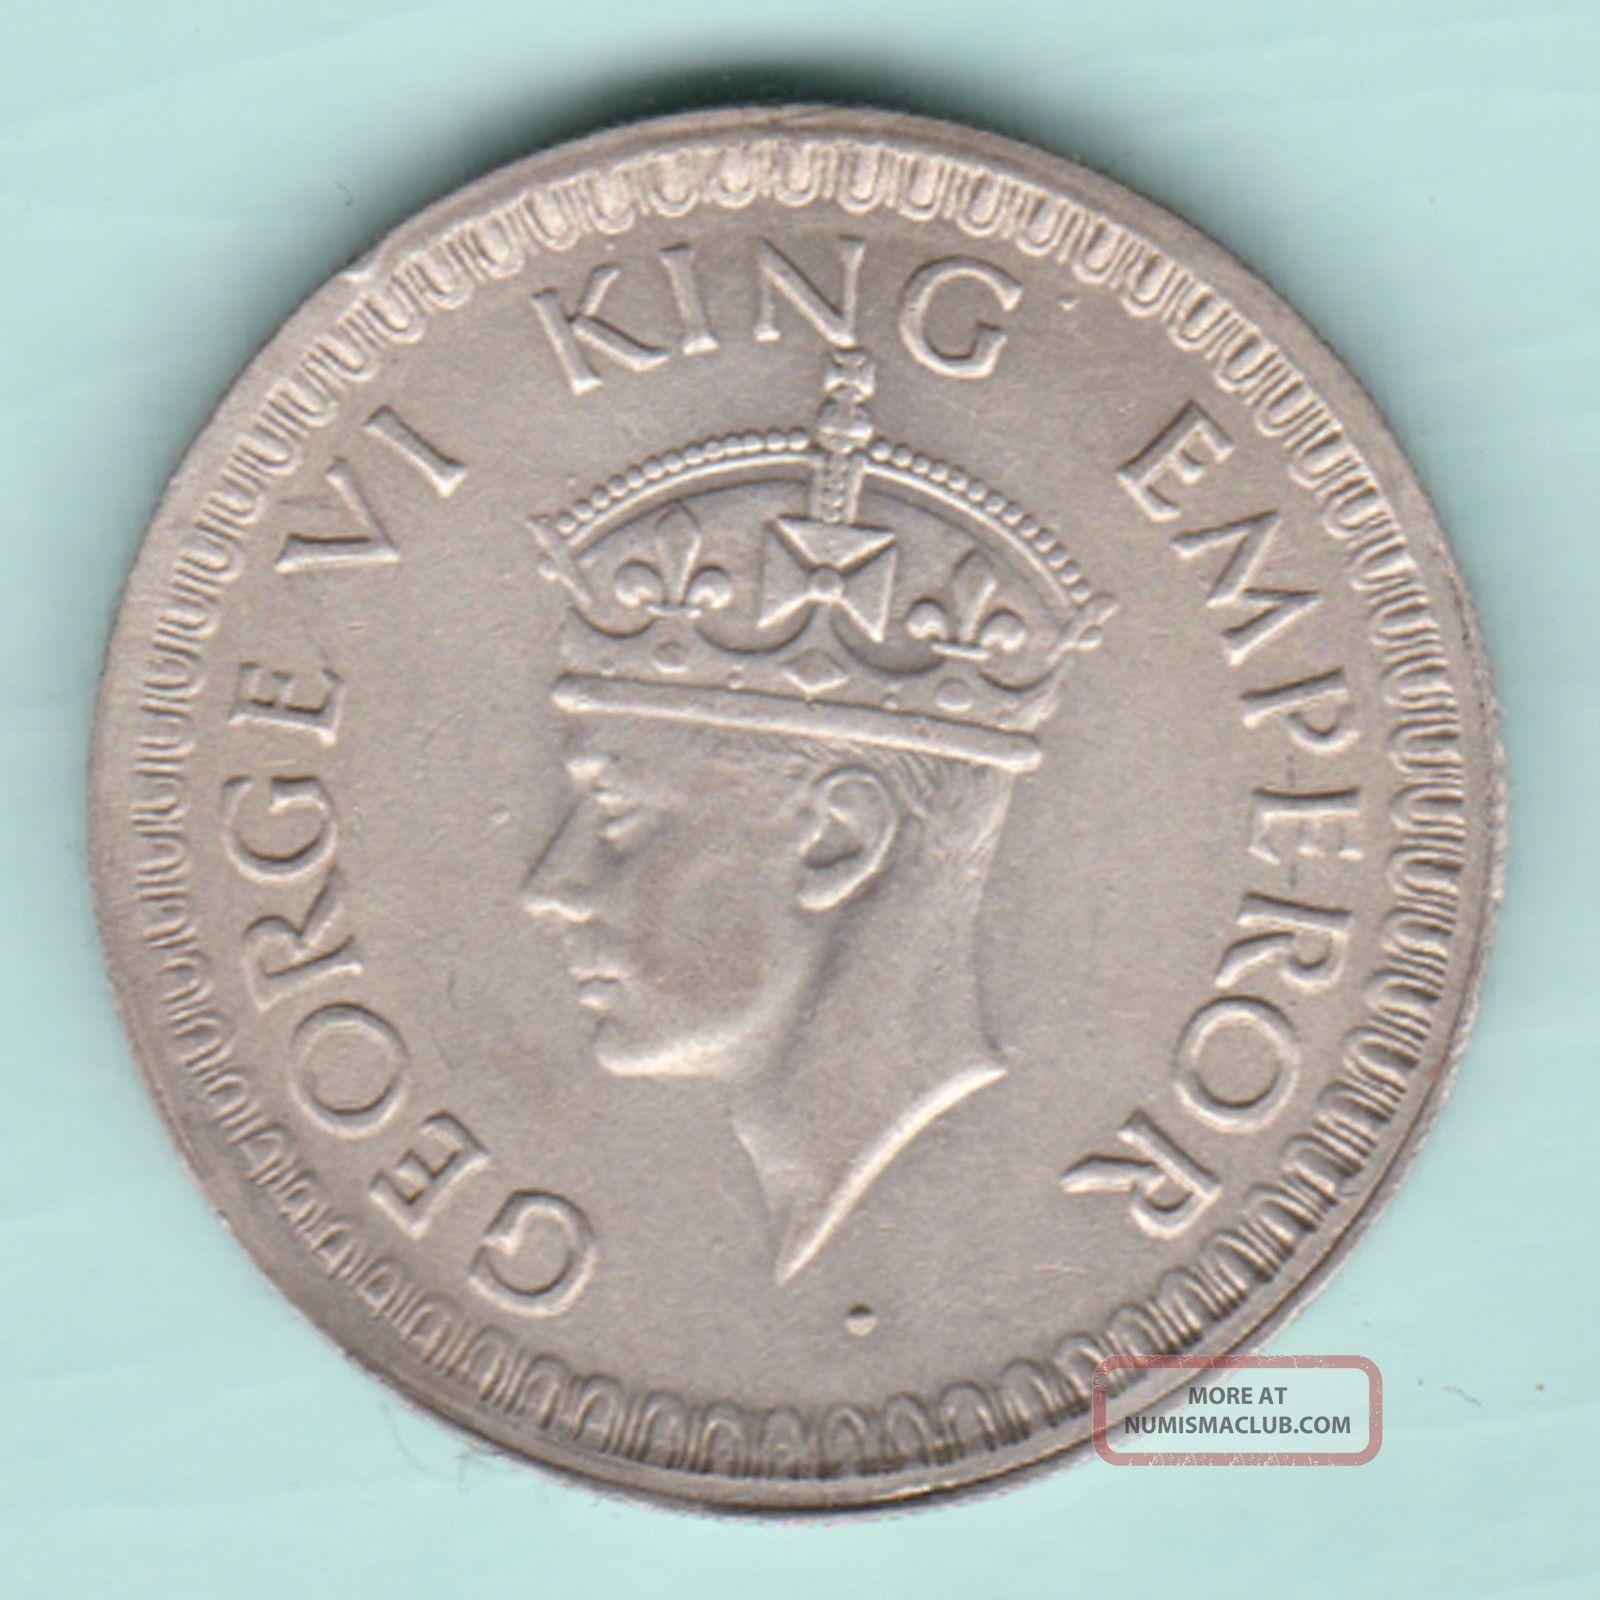 British India - 1944 - King George Vi Emperor - Half Rupee - Bombay - Rare British photo